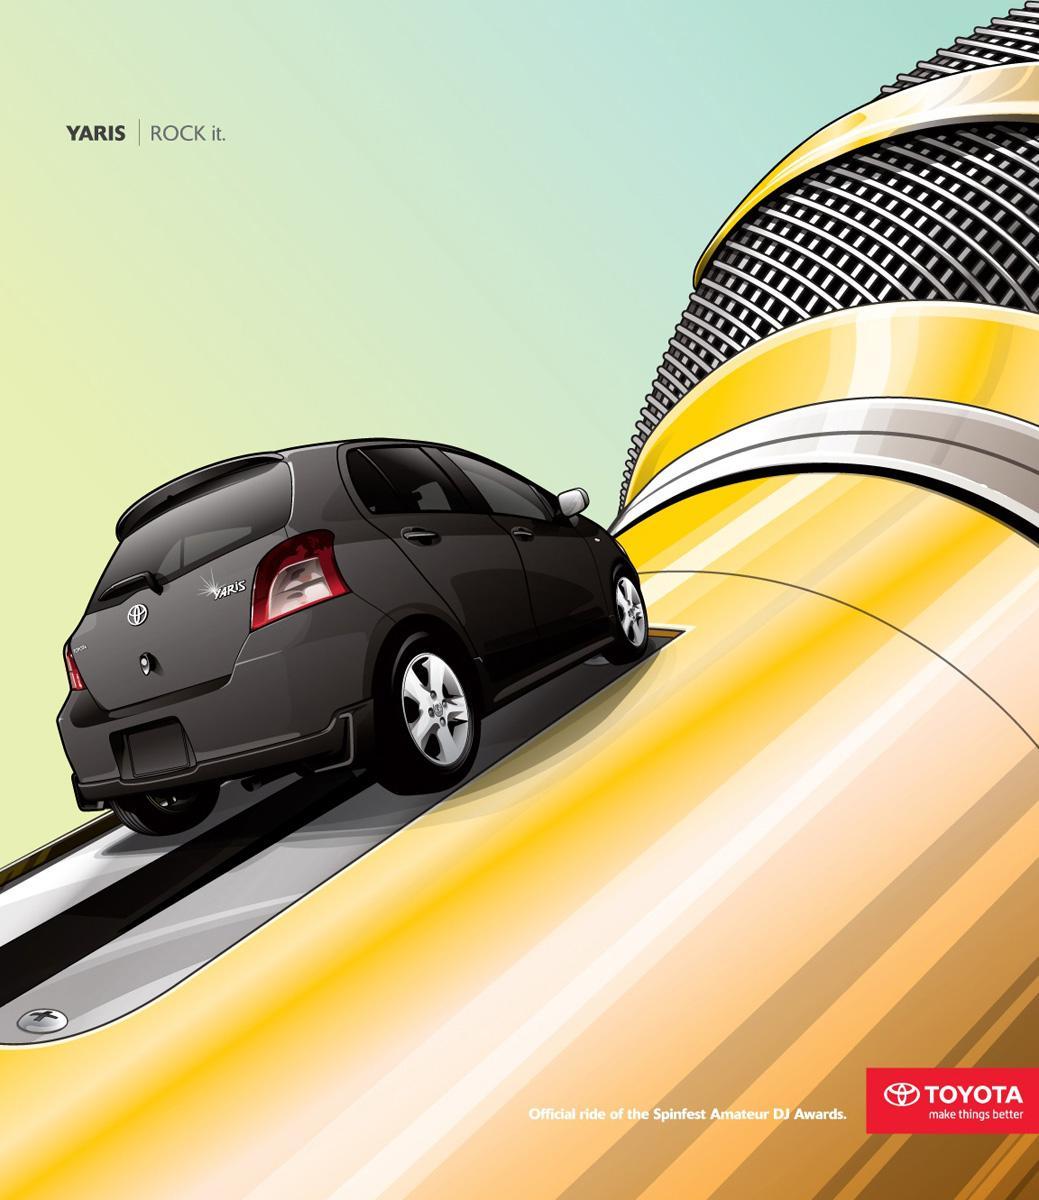 Toyota Print Ad -  Rock